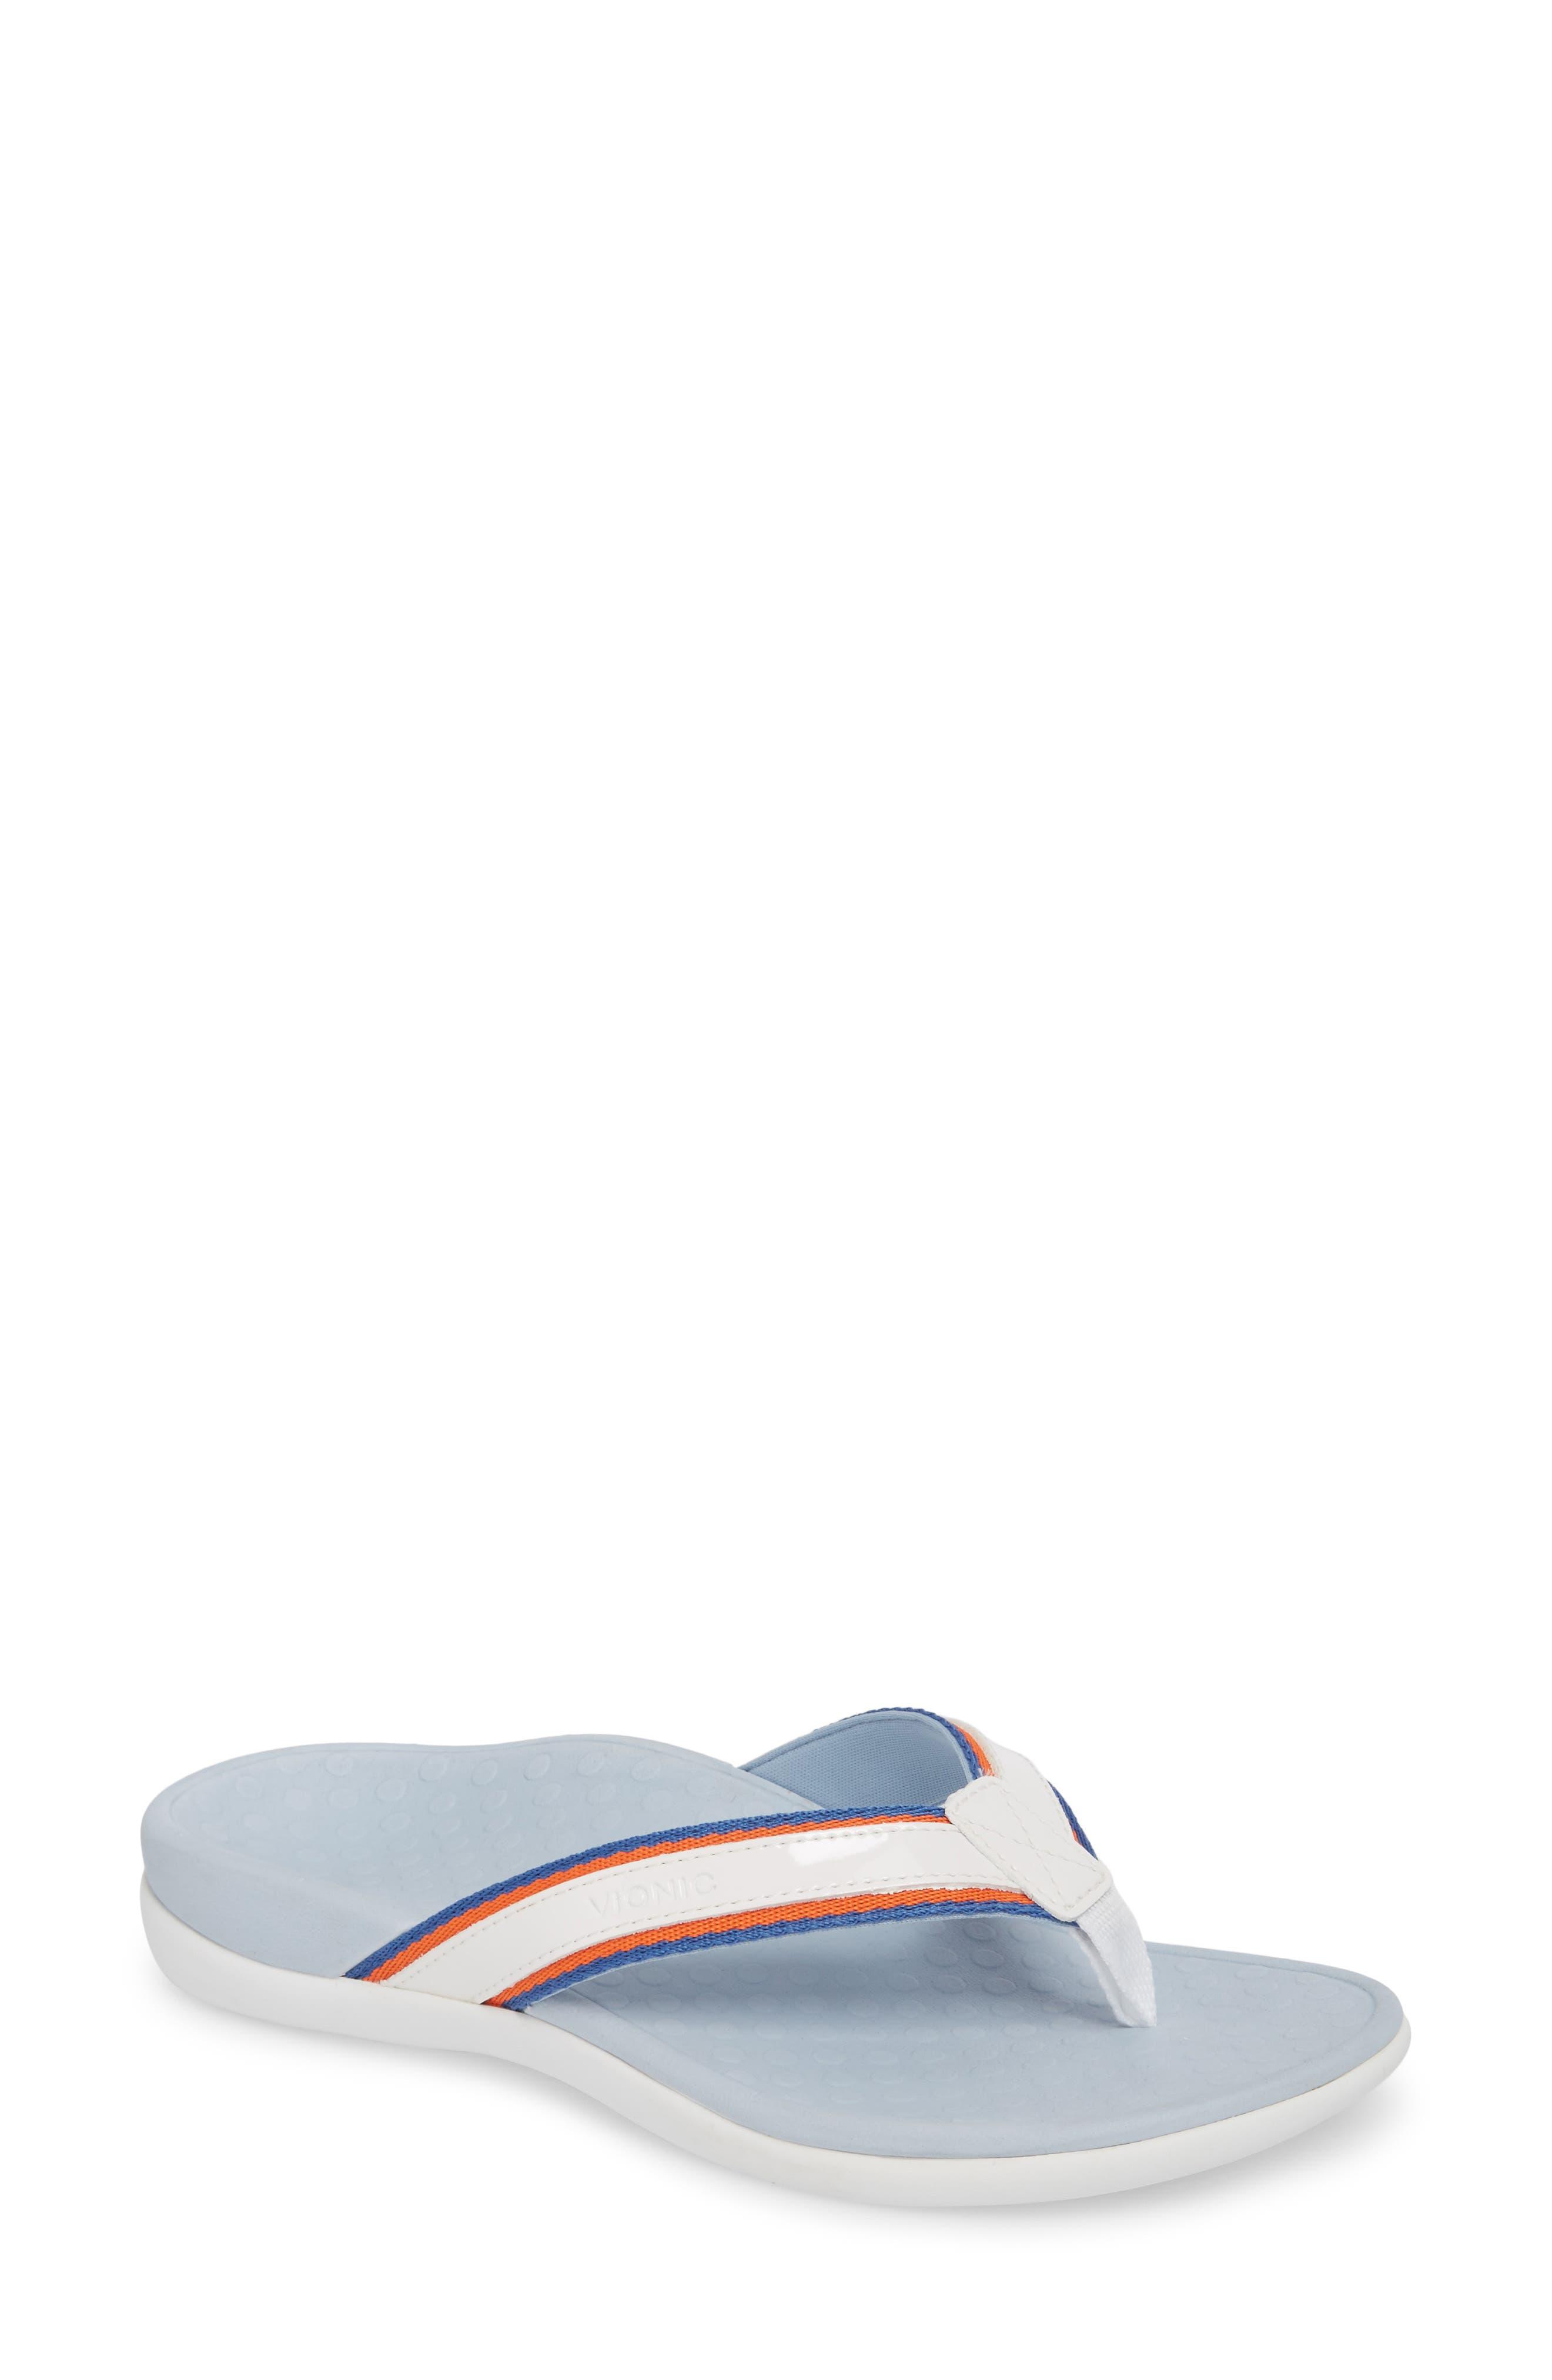 Tide Sport Flip Flop,                         Main,                         color, 402